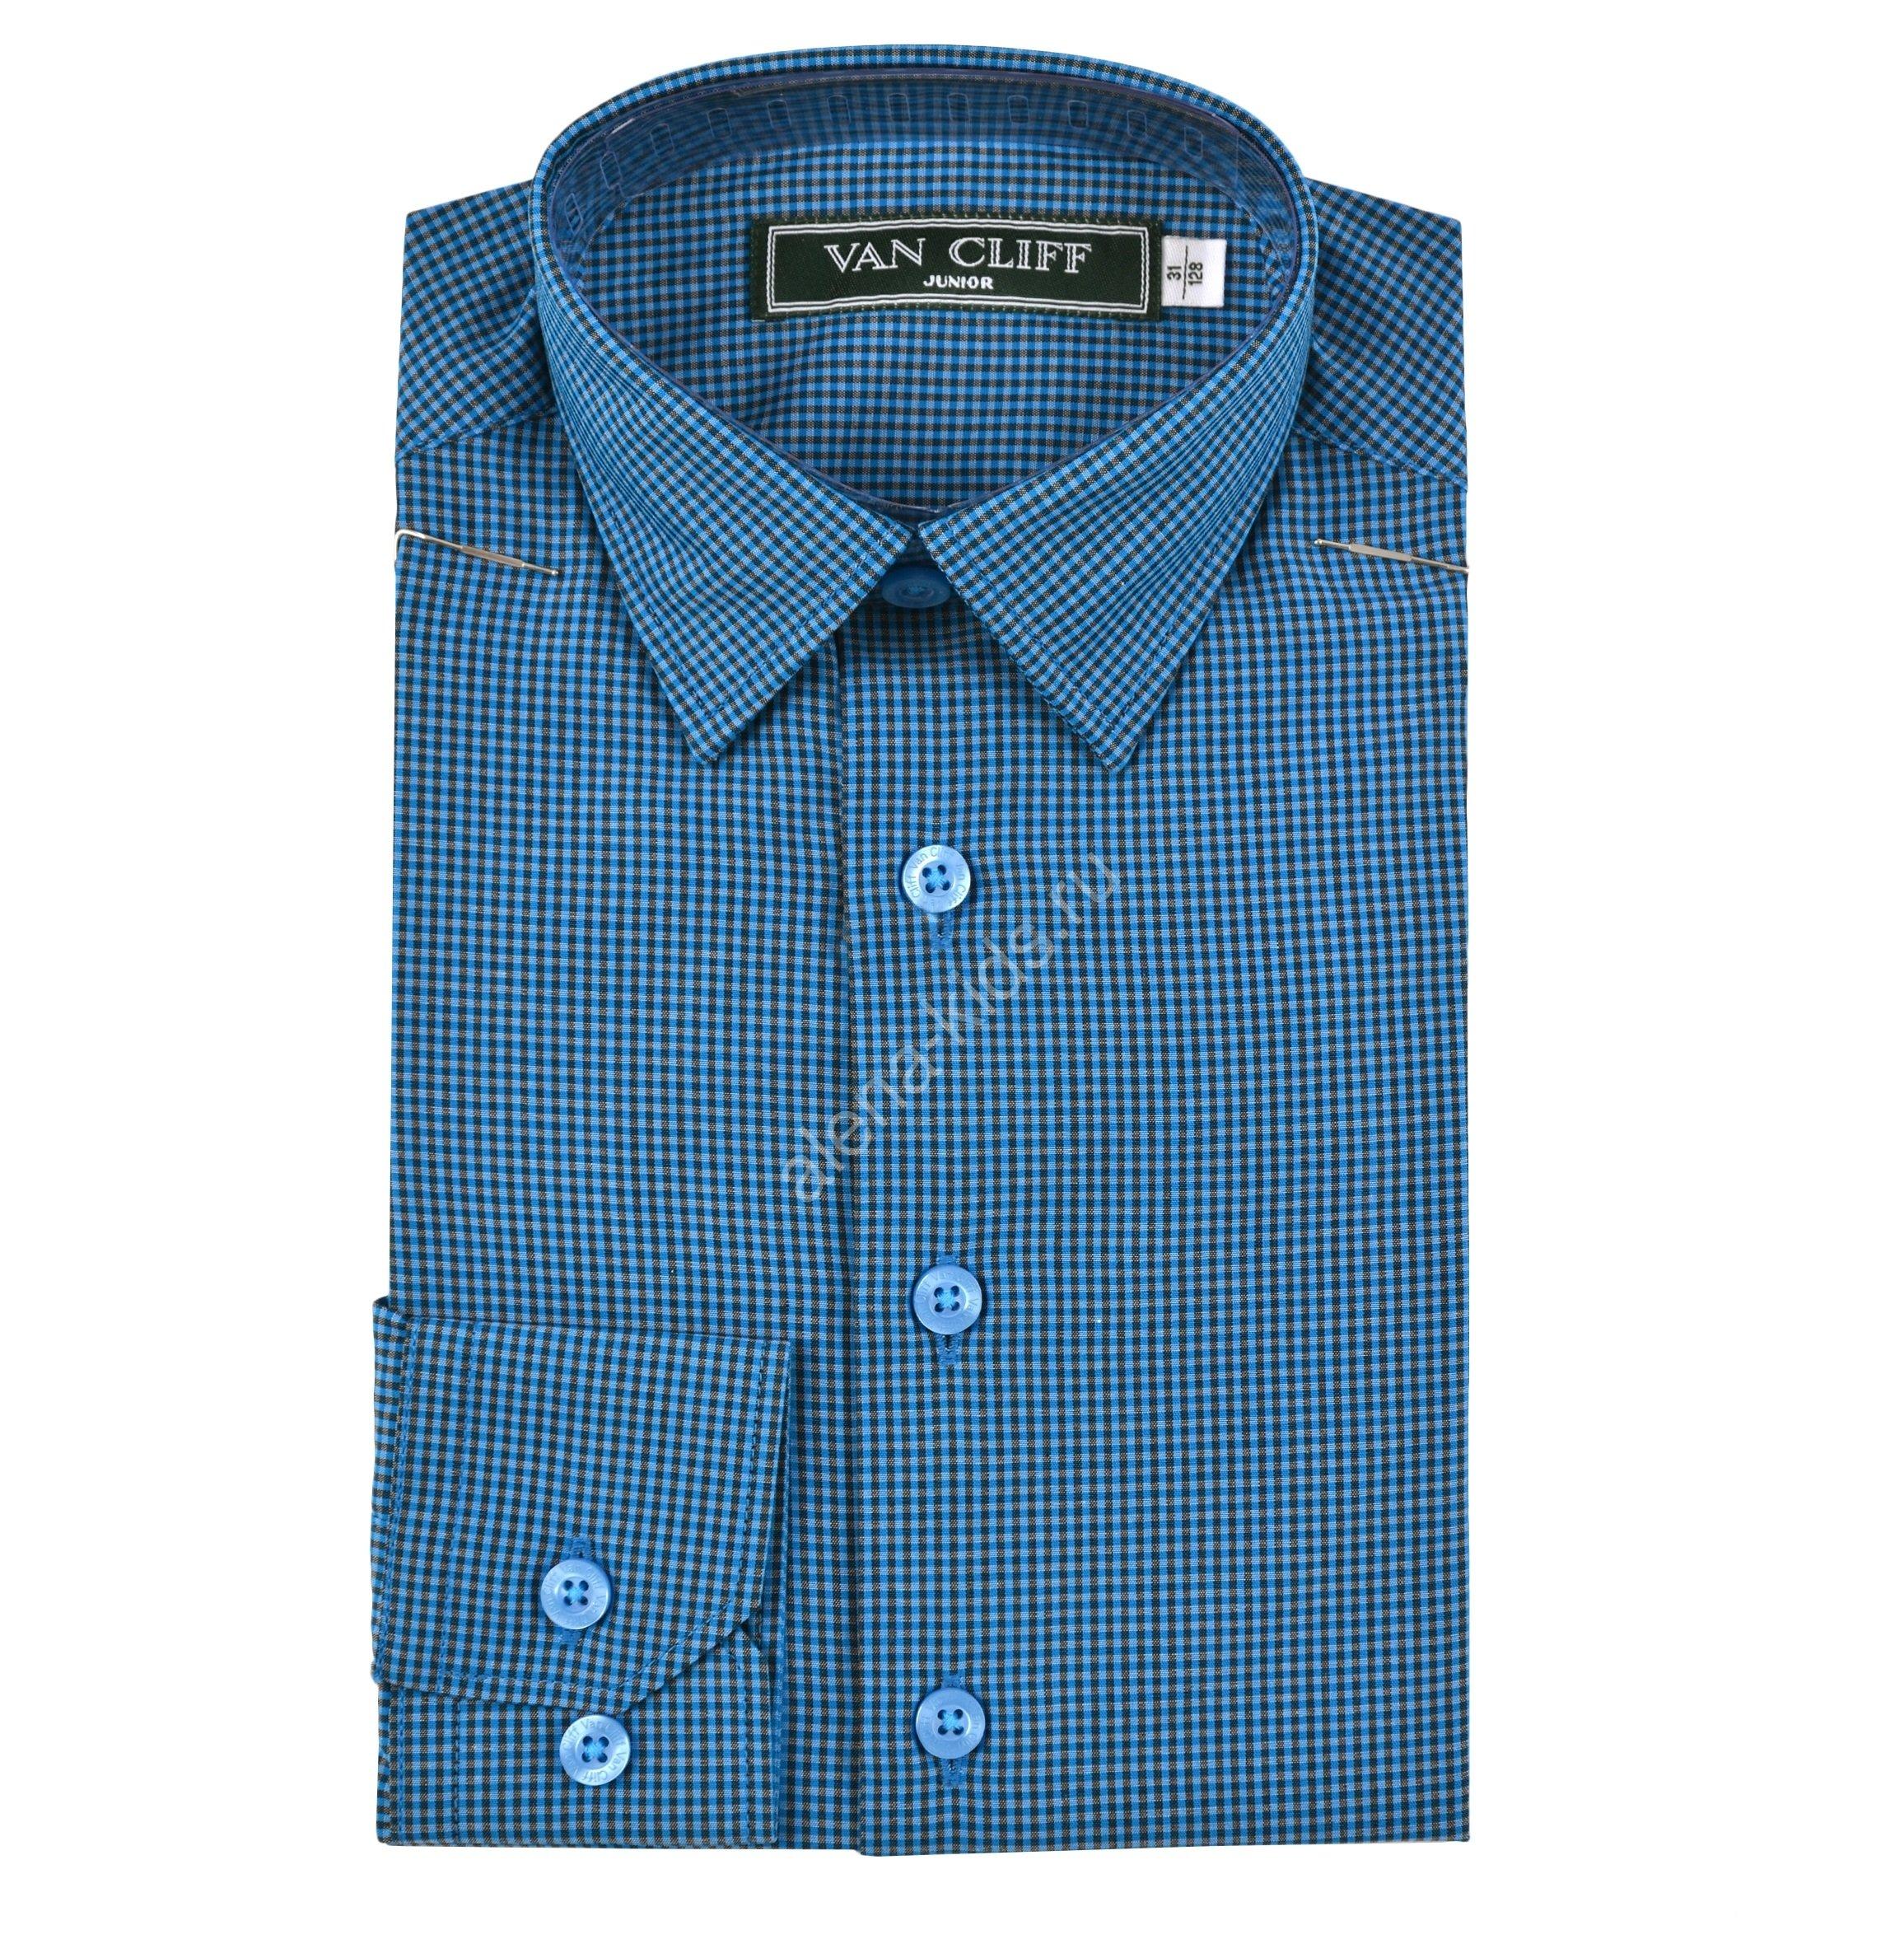 Рубашка для мальчика YSVC16582бир-сер